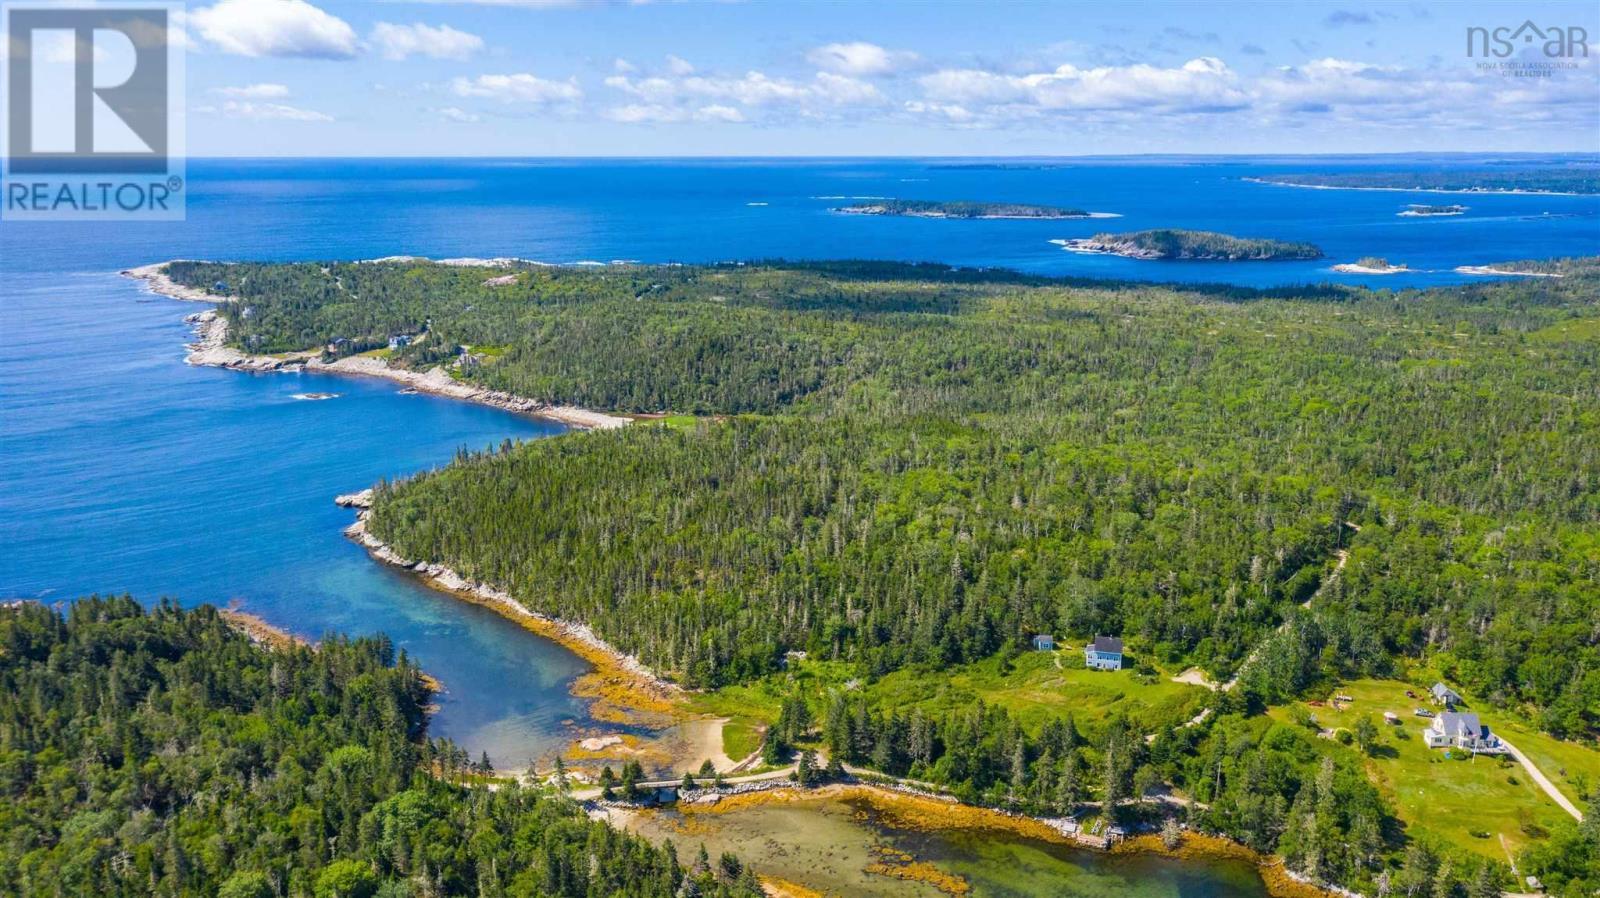 Lot W20-3 Owl's Head Drive, Southwest Cove, Nova Scotia  B0J 1T0 - Photo 16 - 202125696